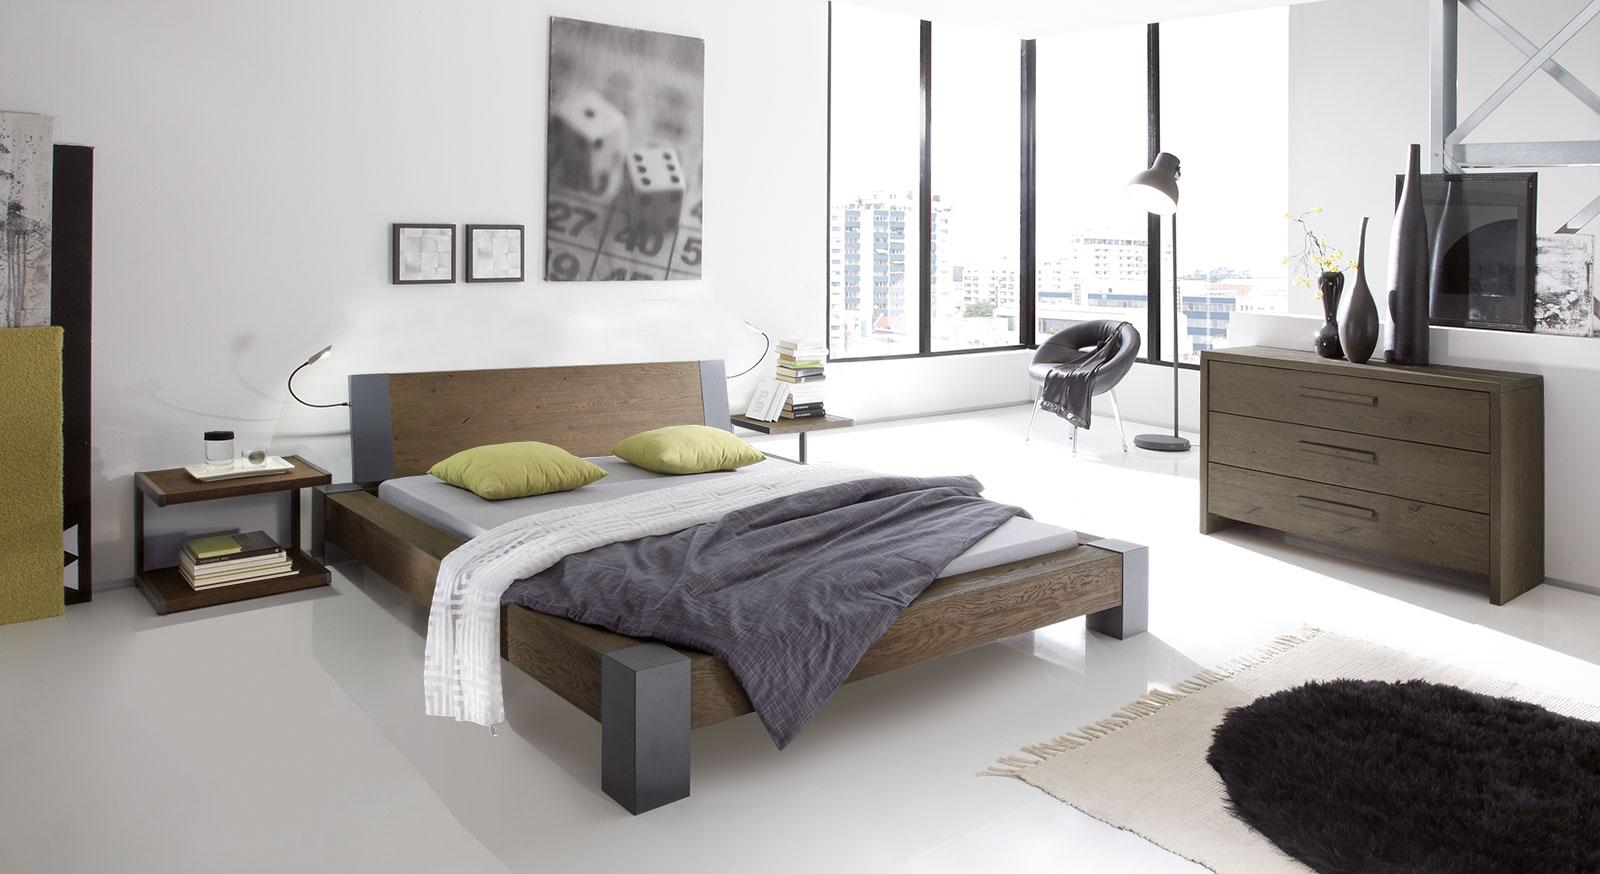 Massivholz-Futonbett Sangro mit passenden Produkten